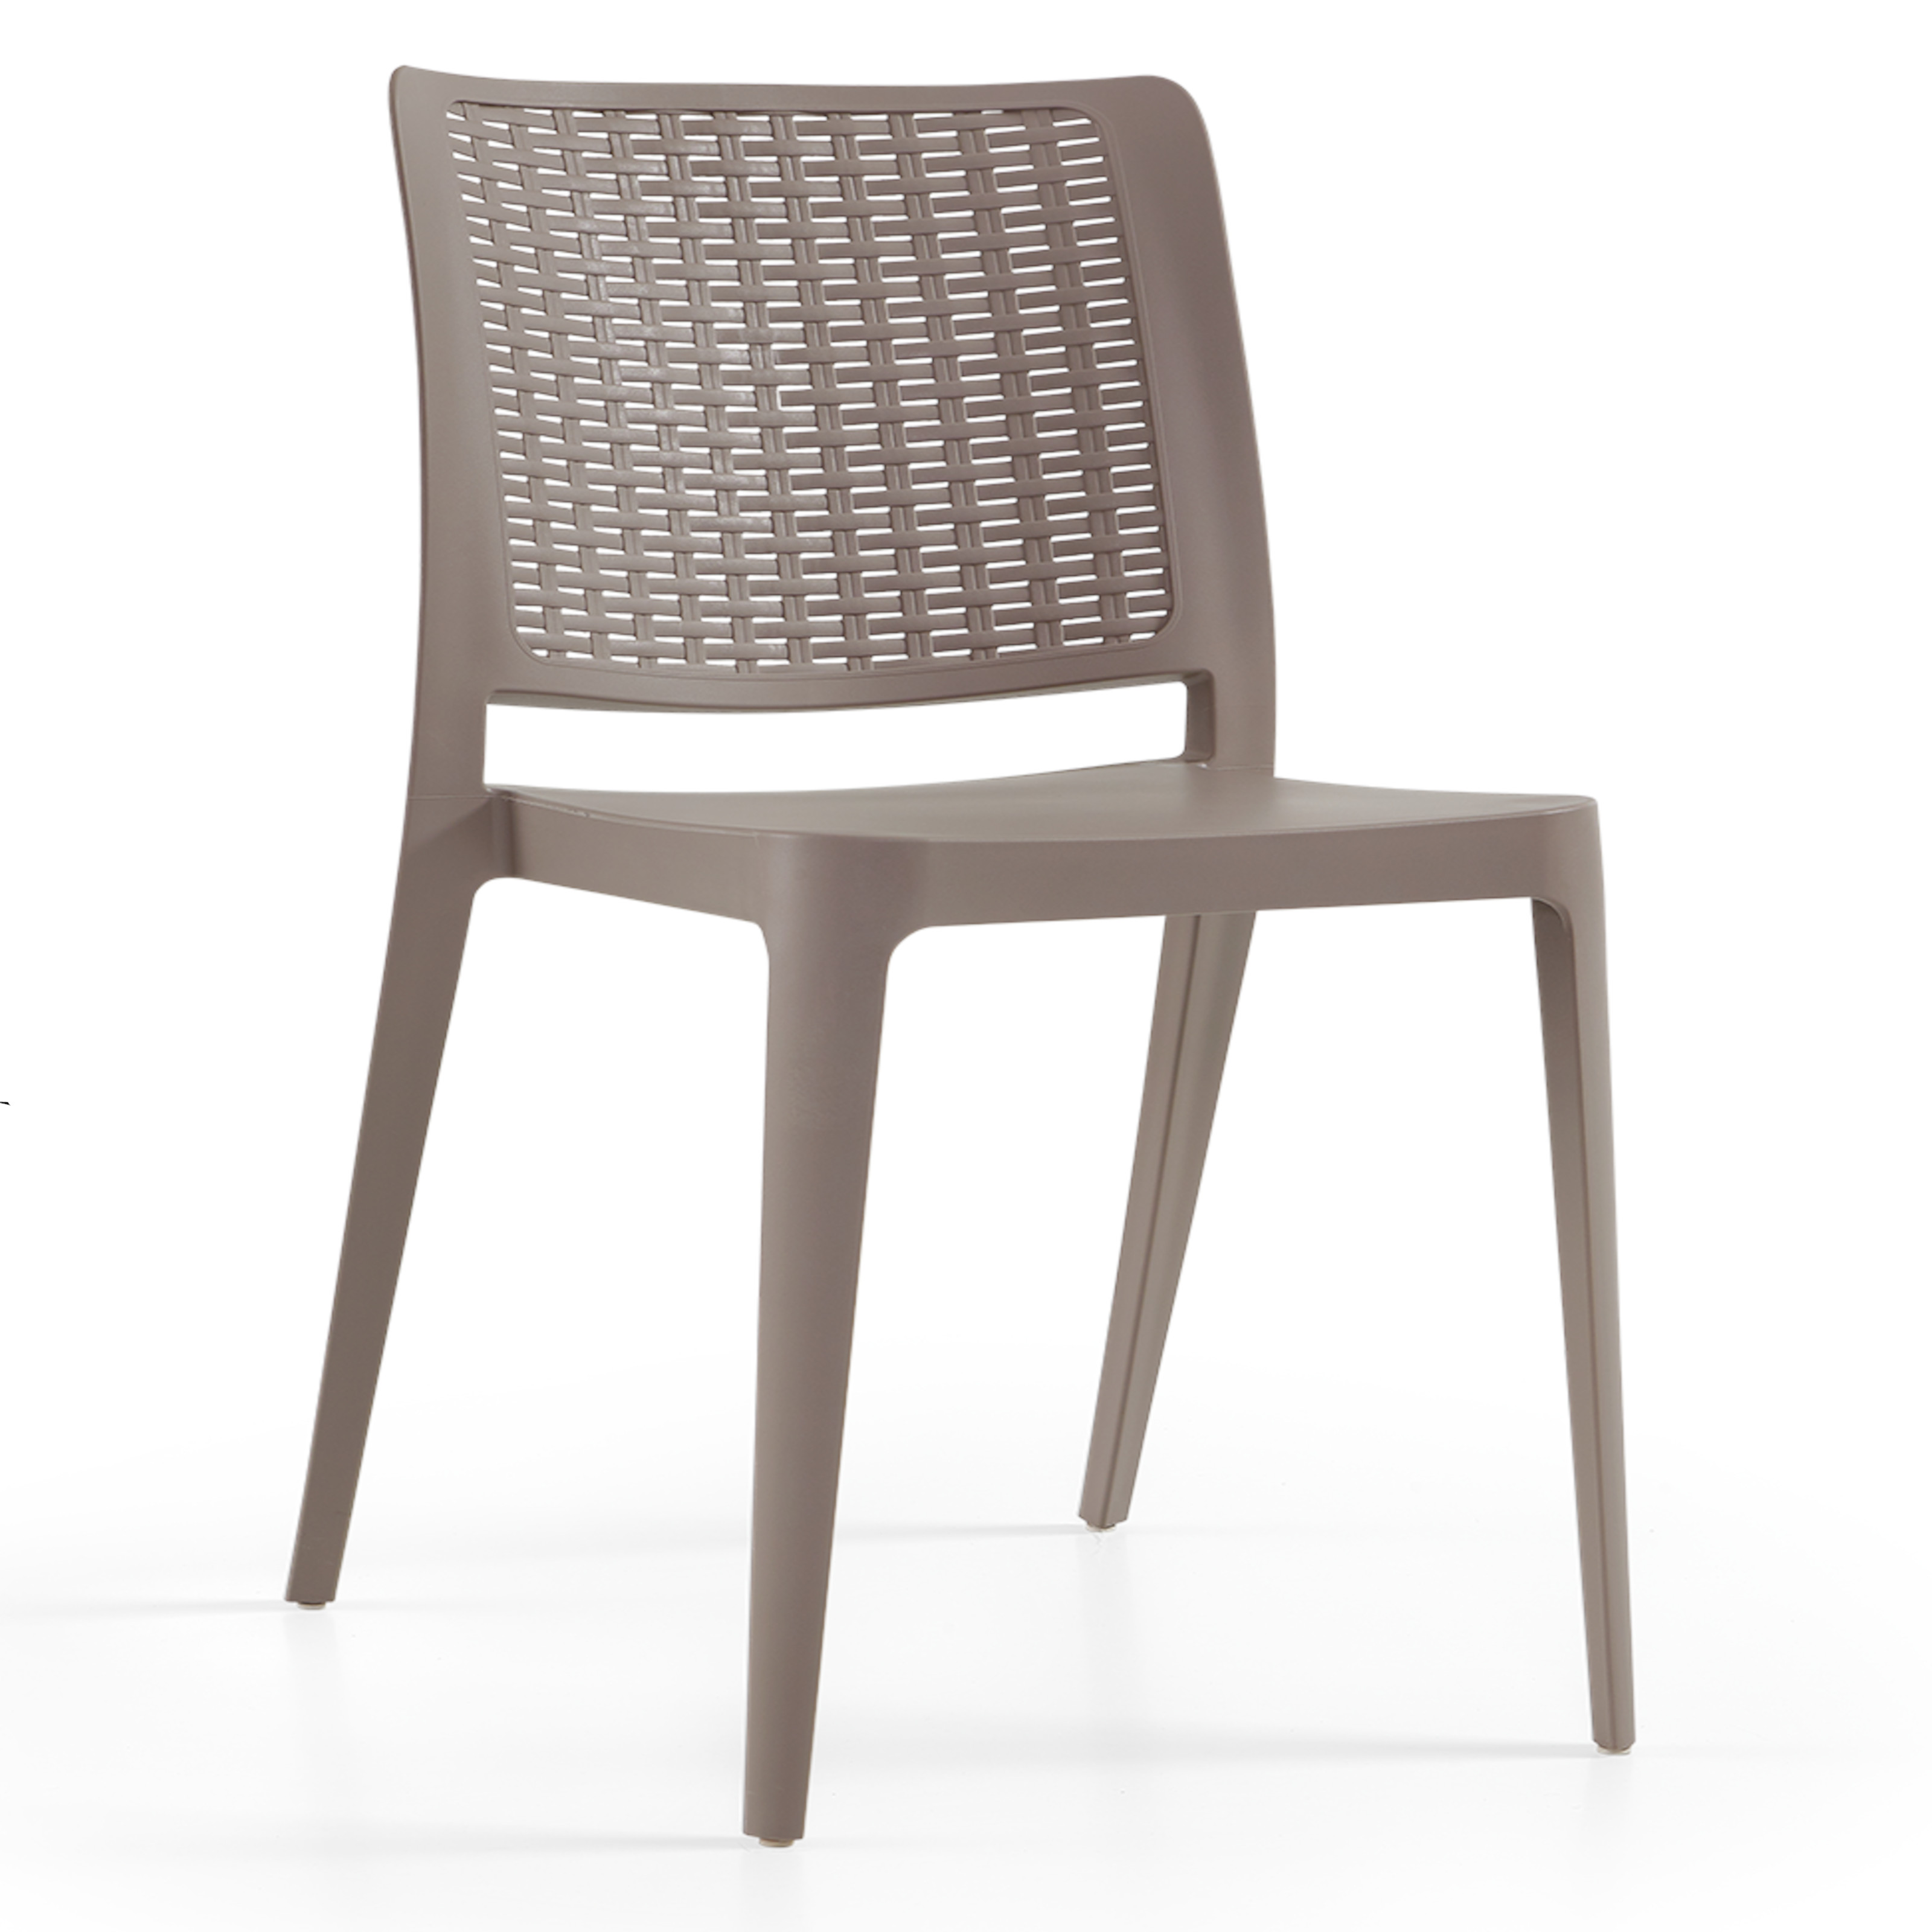 June Chair Turtledove